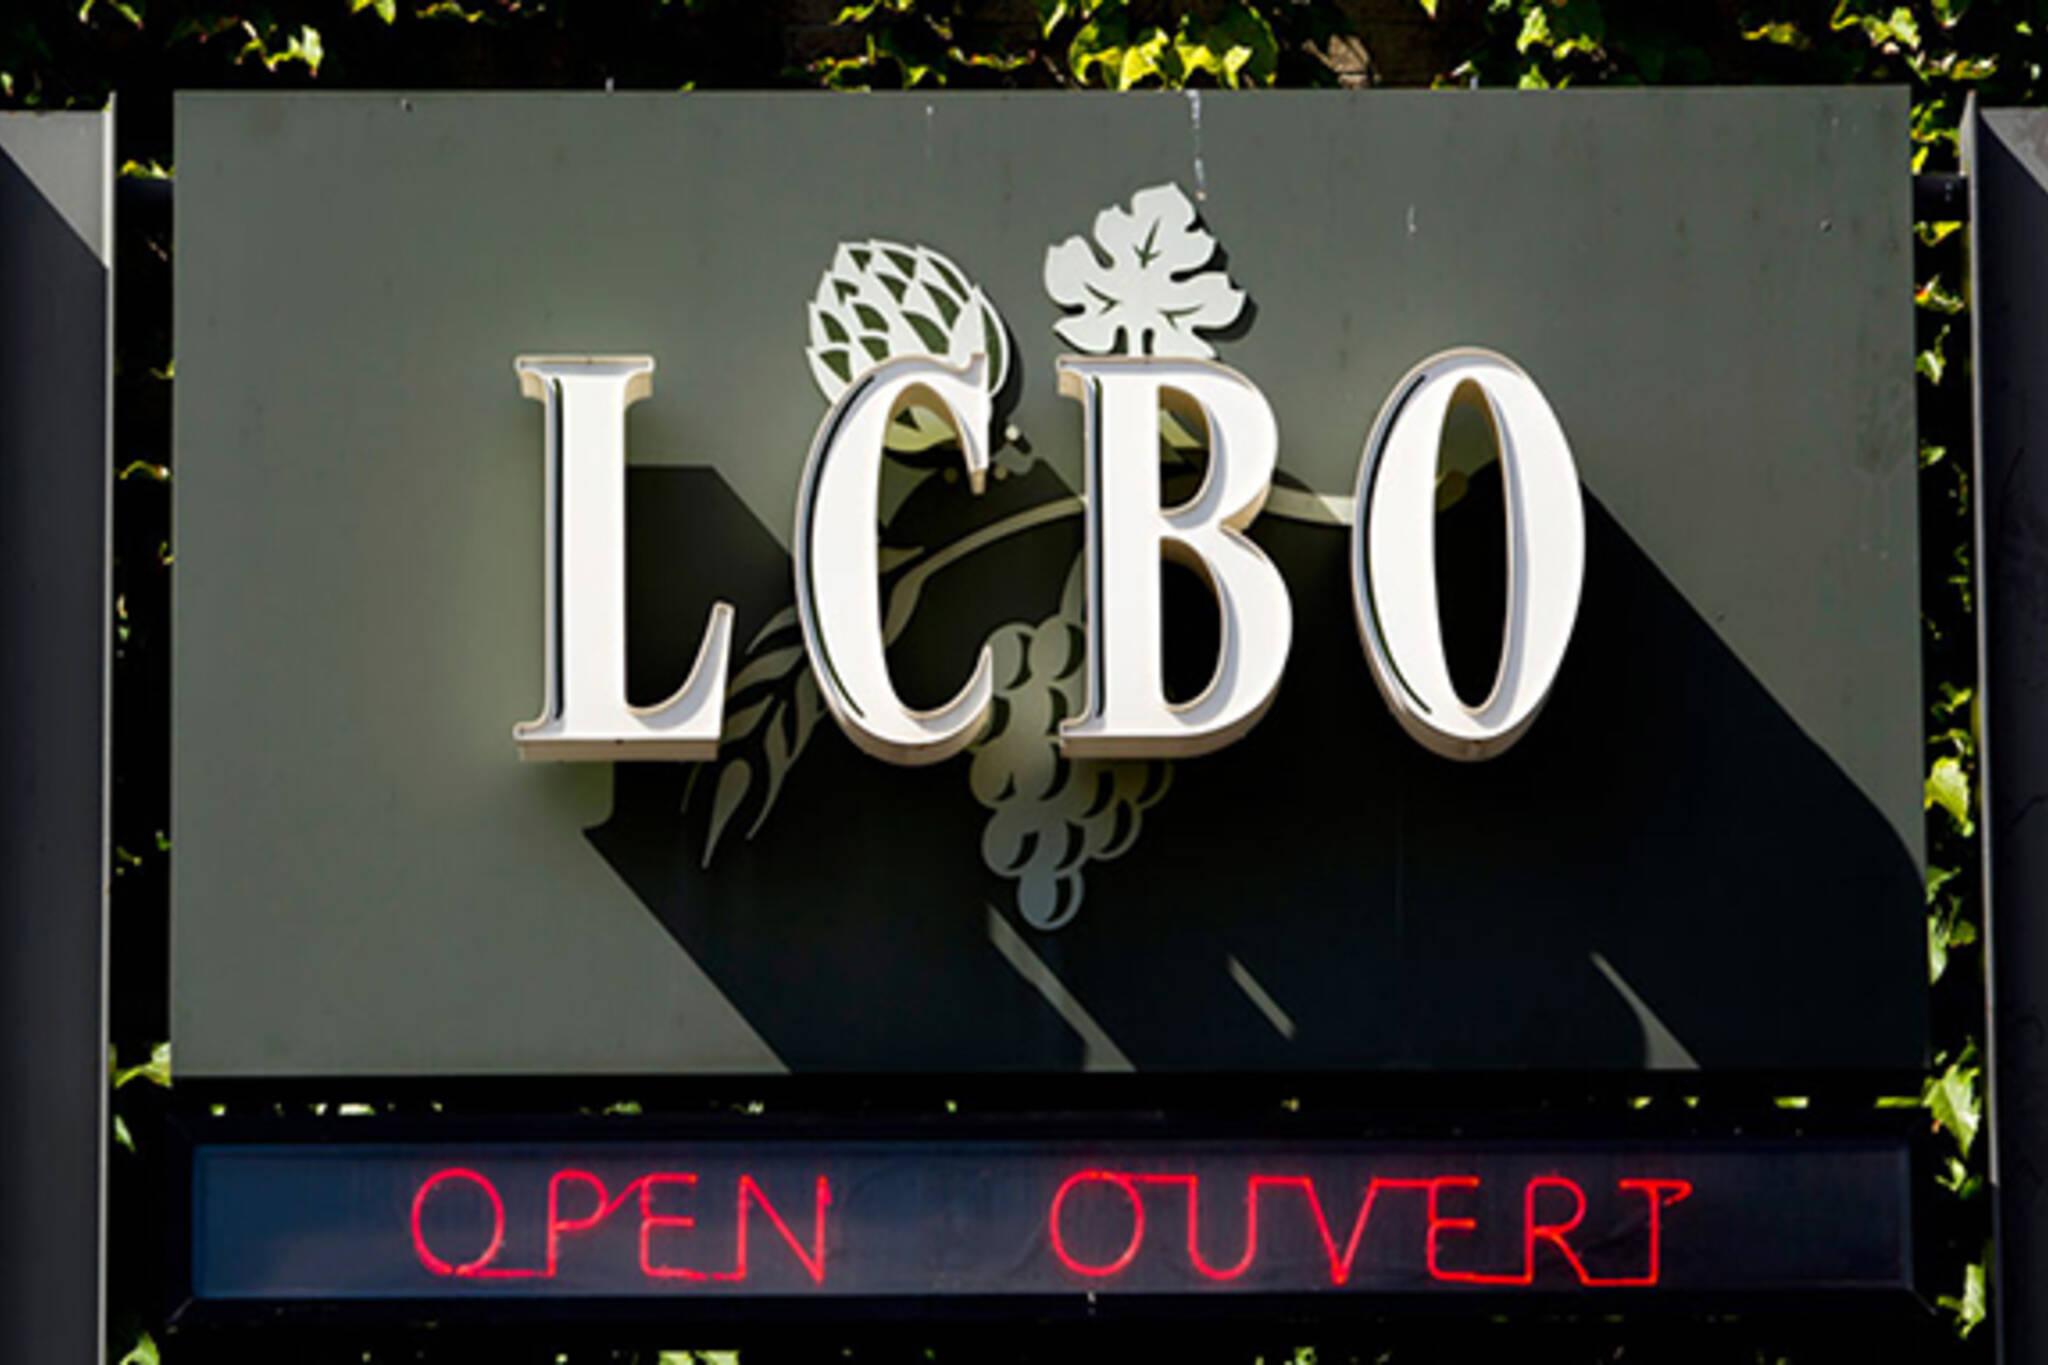 lcbo open late toronto